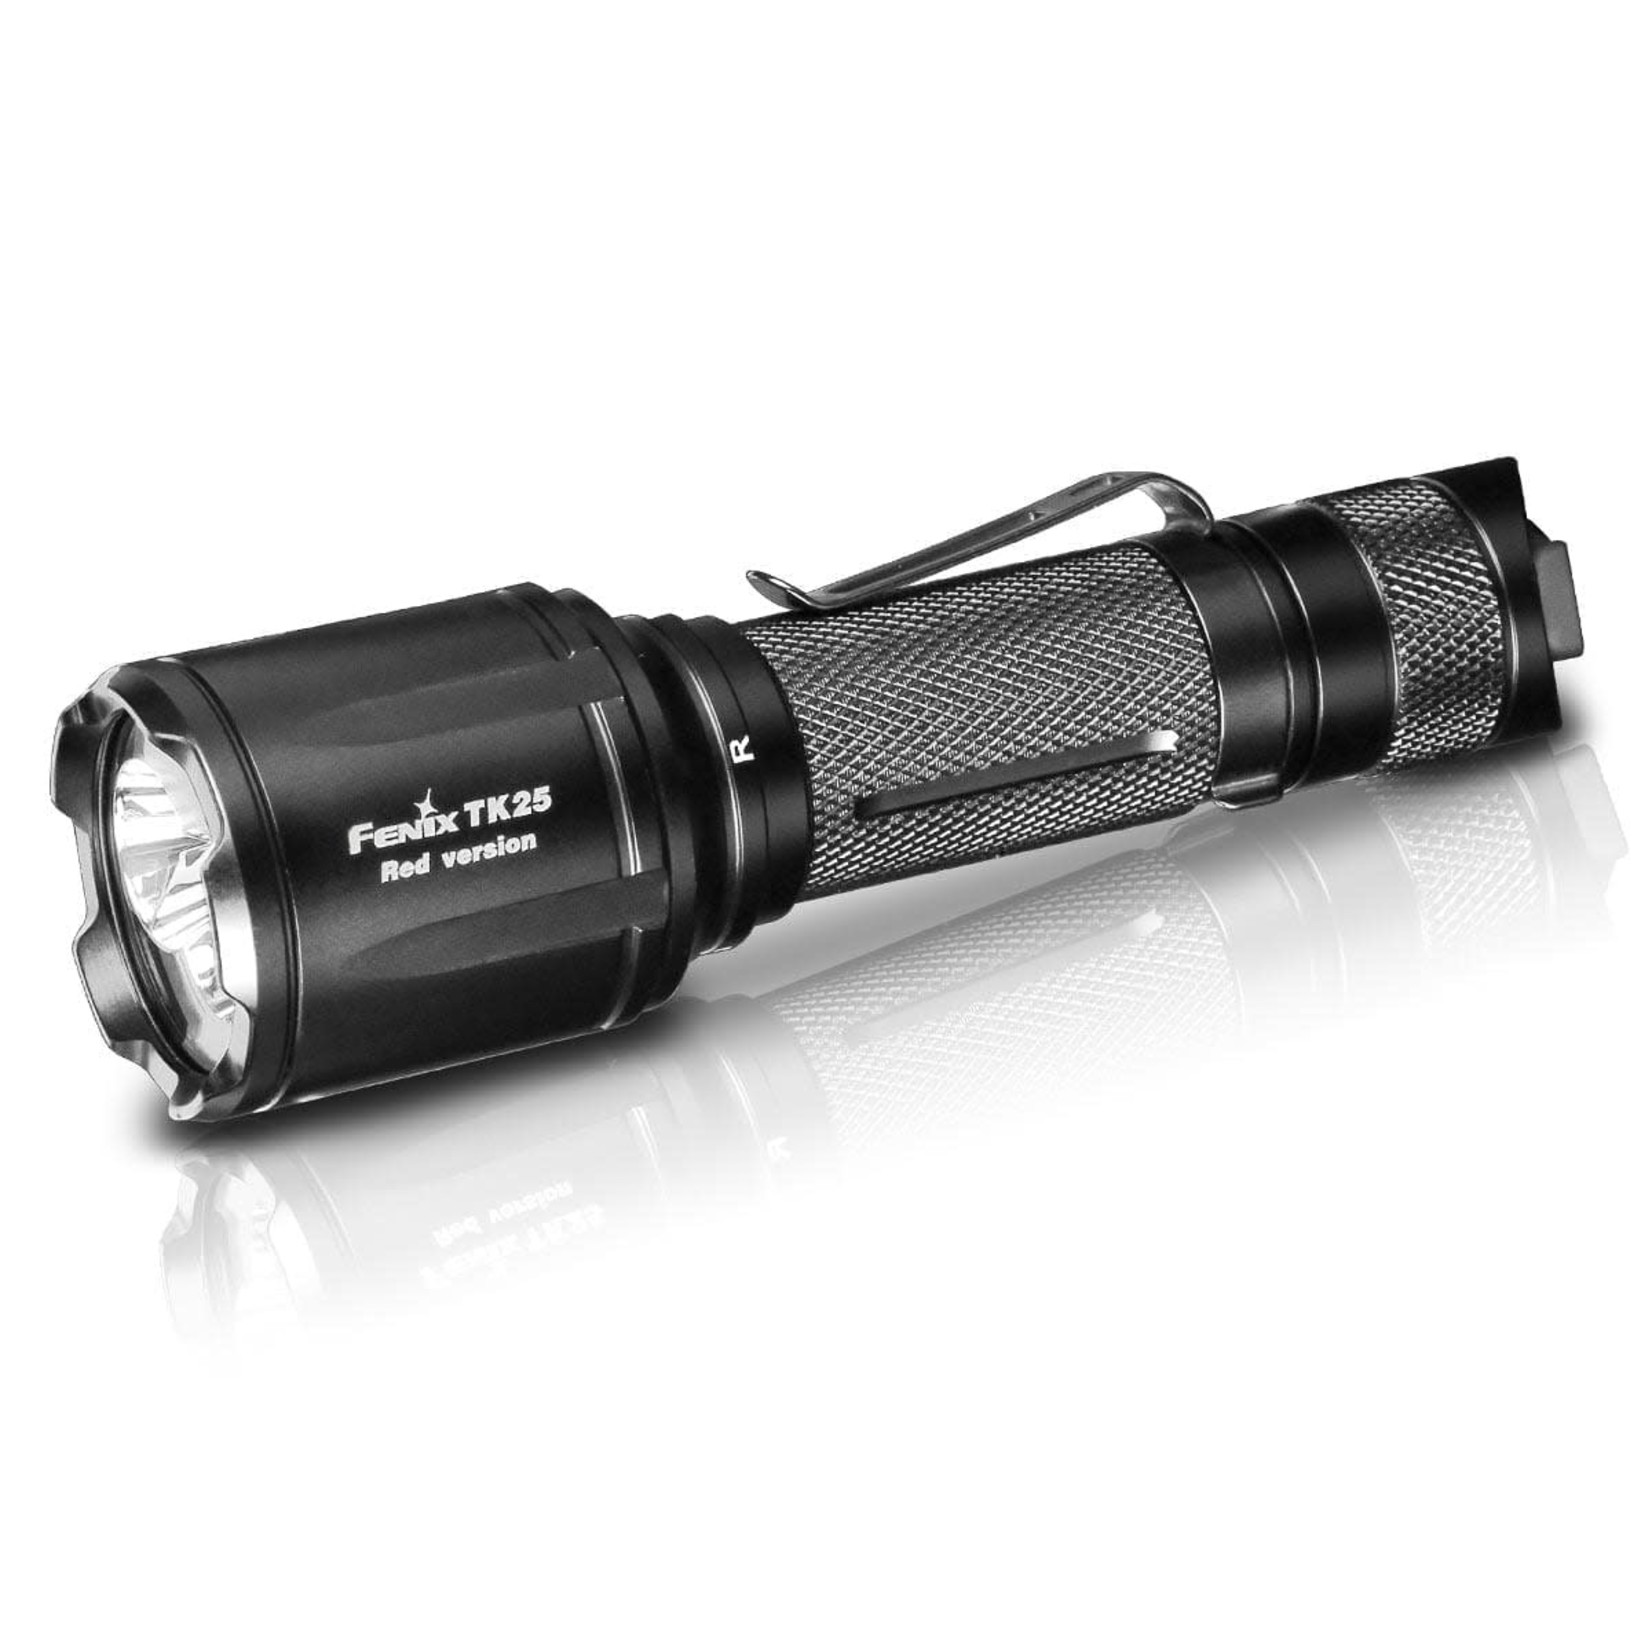 Fenix TK25 Red Flashlight